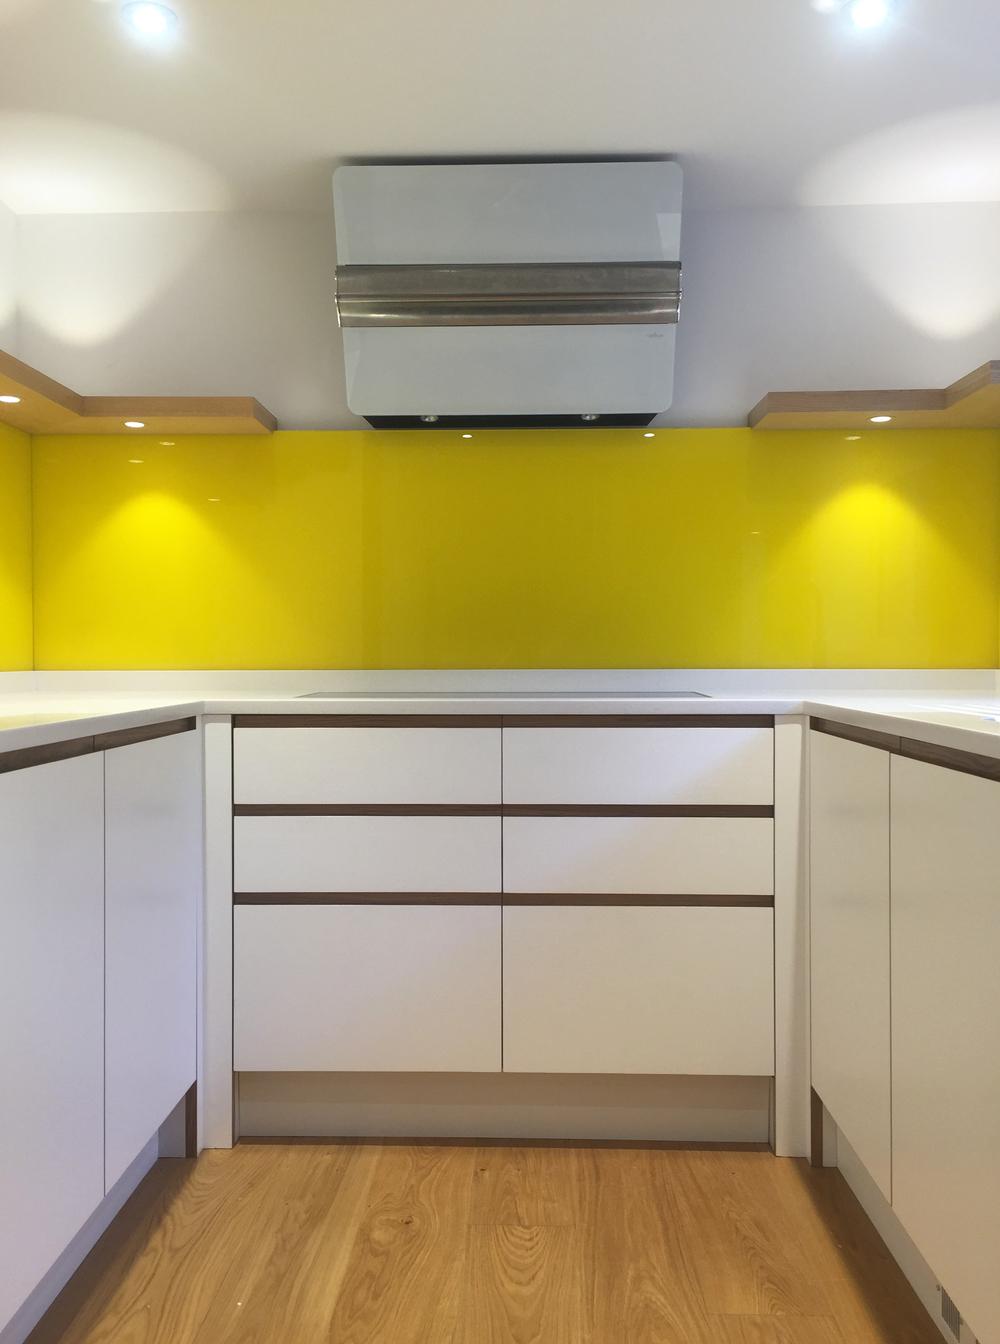 Square-One-Design-kitchen-oak-Antartica-corian-Formica-glass-yellow-4.jpg